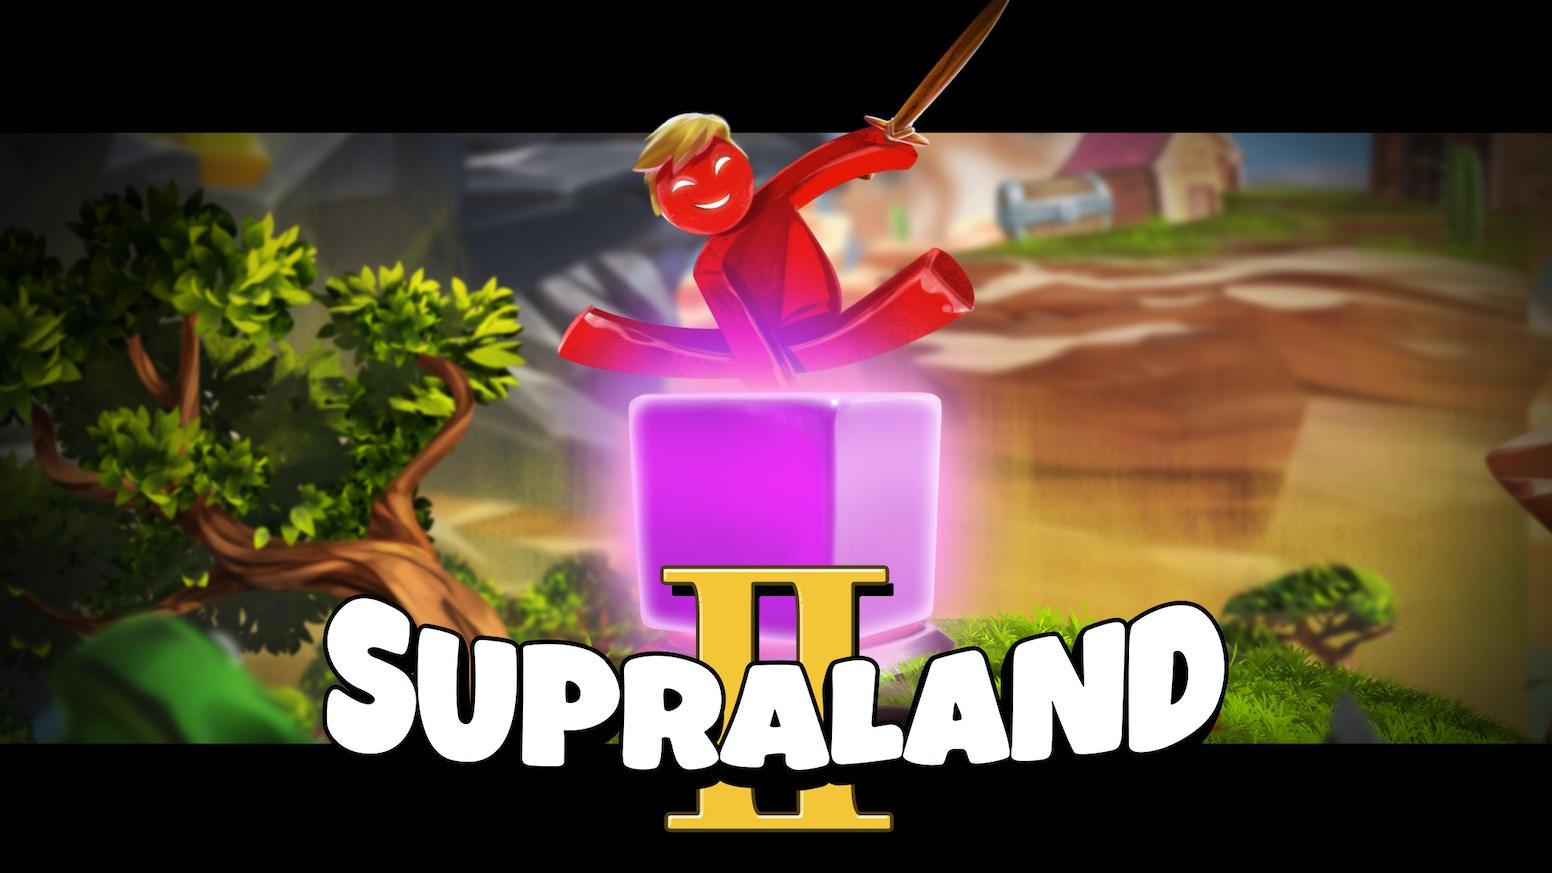 Supraland 2 by Supra Games — Kickstarter